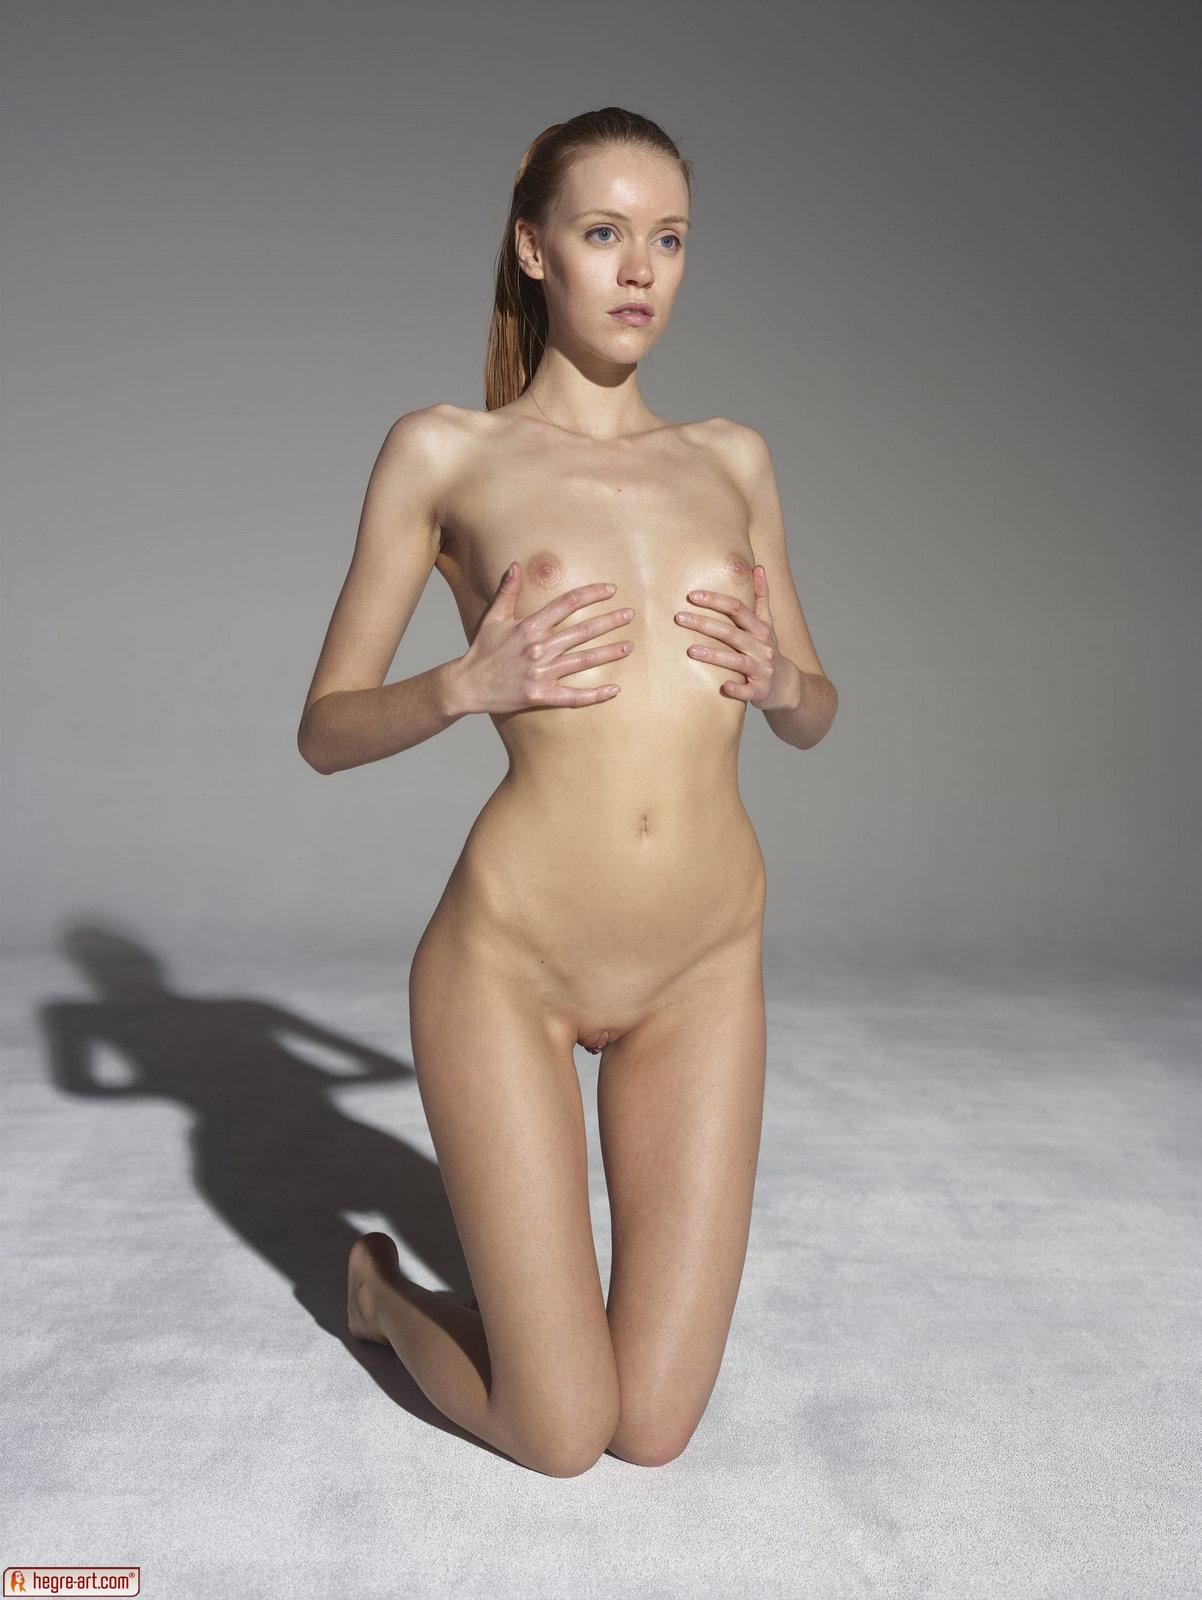 Full nude body shots